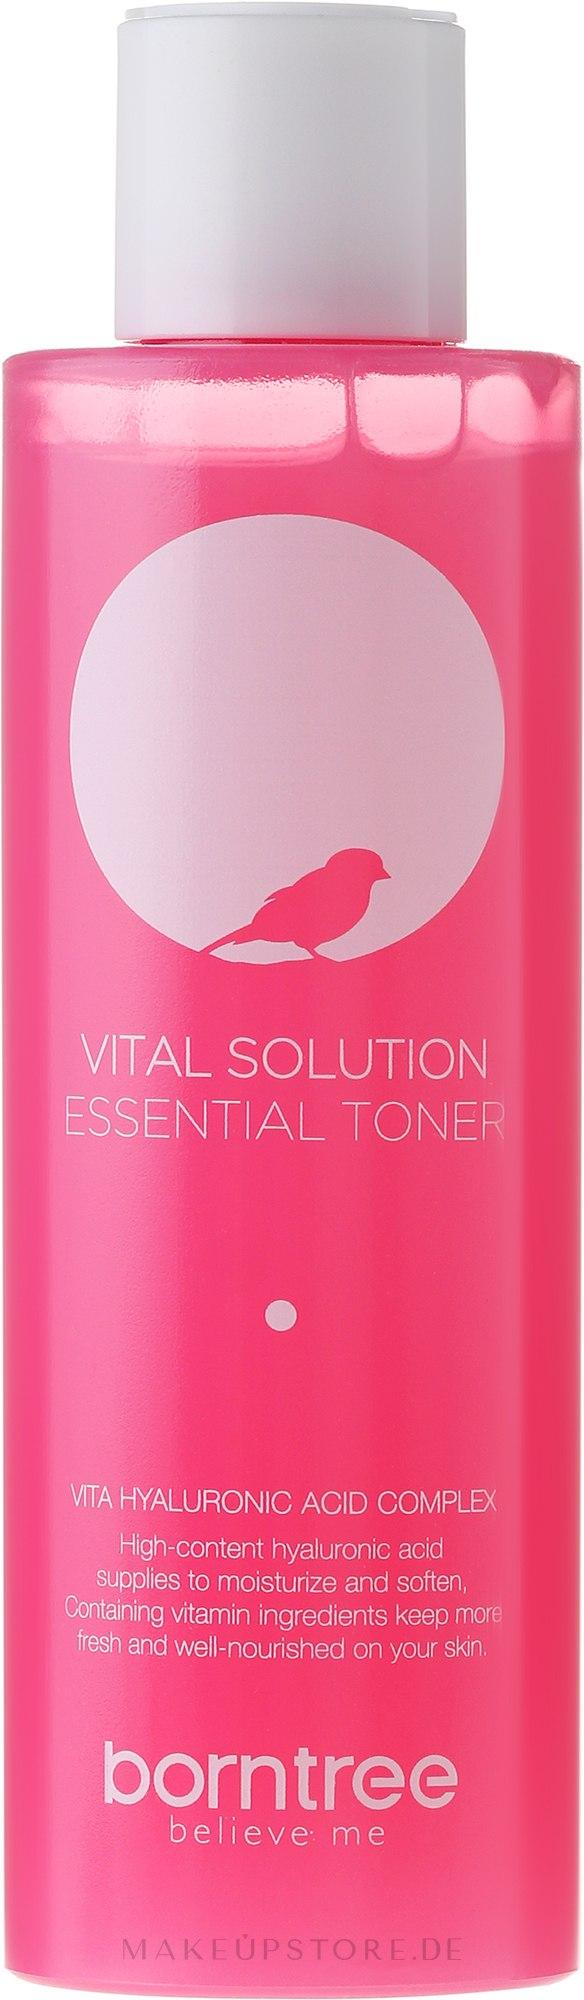 Gesichtstonikum mit Hyaluronsäure - Borntree Vital Solution Essential Toner — Bild 150 ml